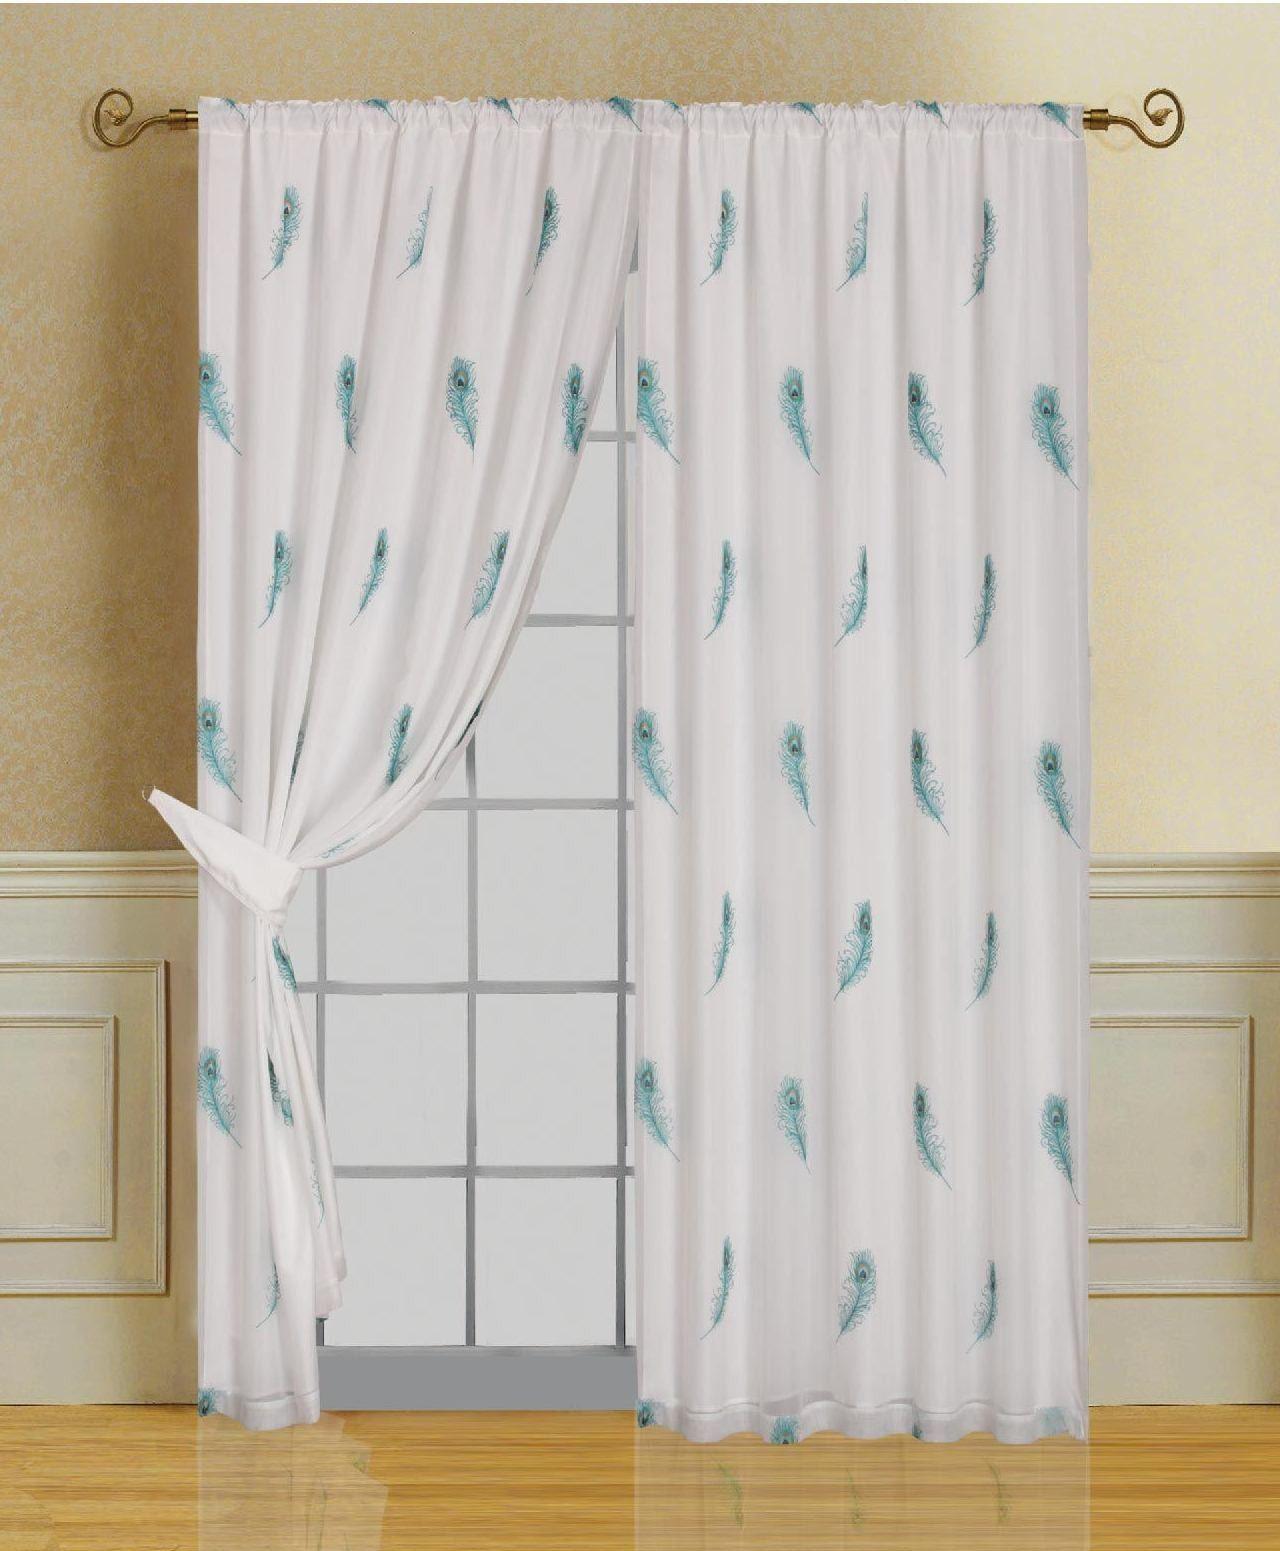 Peacock Blue Curtains Drapes Minimalist Home Design Pinterest